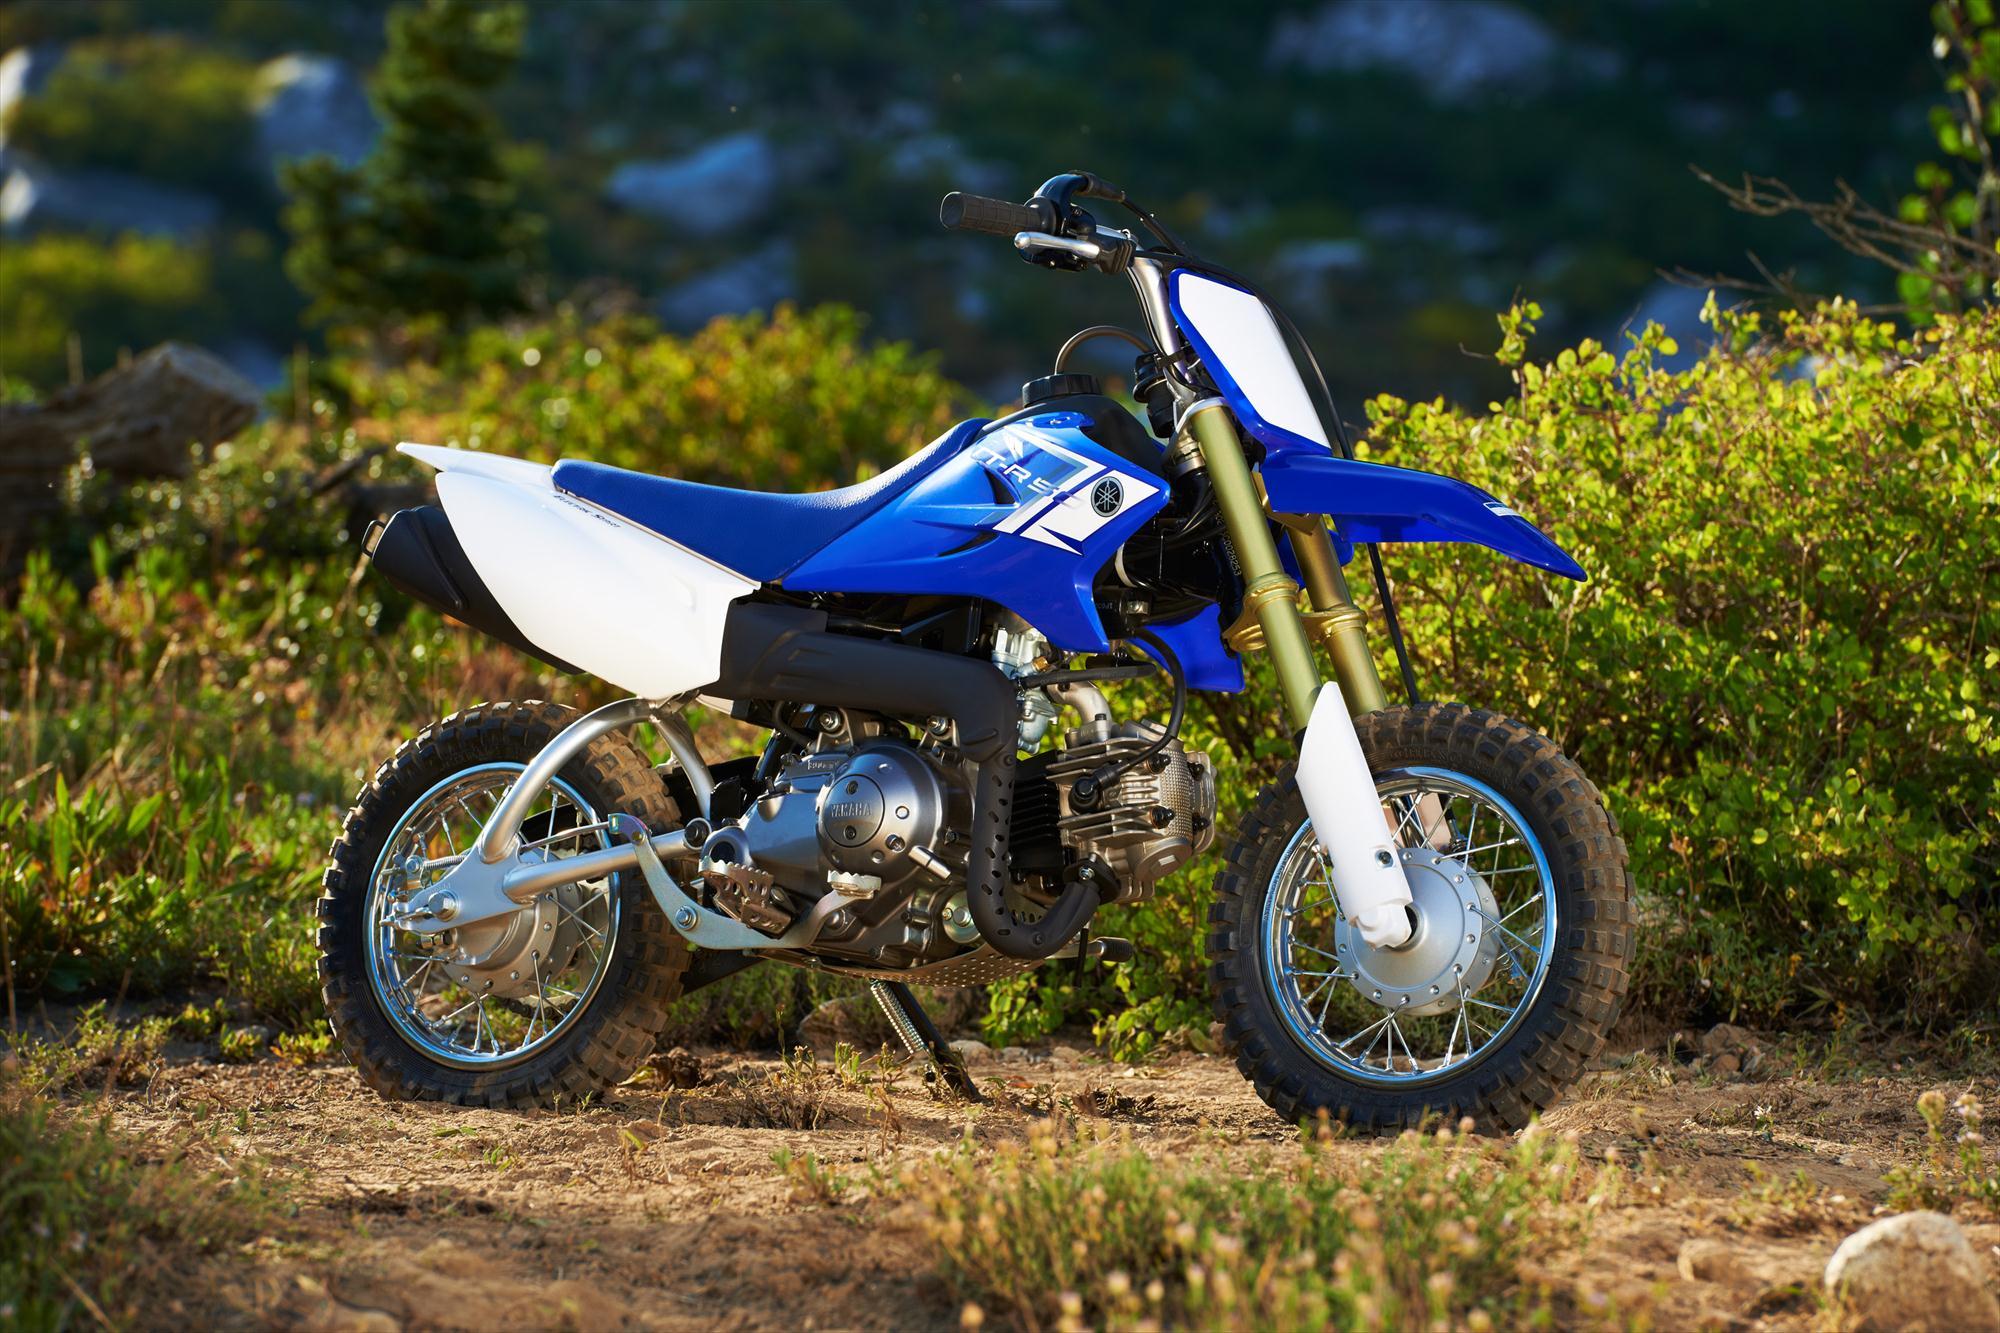 Dirt Bike For 5 Year Old >> 2013 Yamaha TT-R50E, 3-speed, Automatic Dirt Bike for Kids - autoevolution